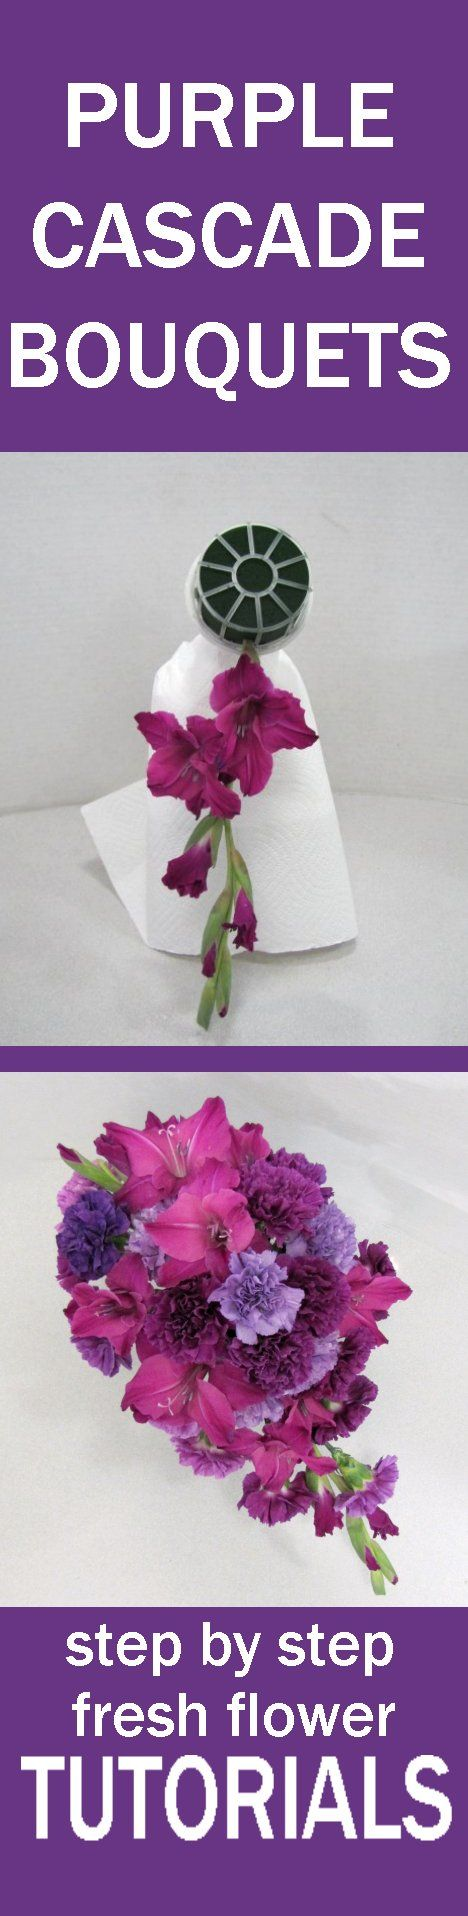 70 best gladiolus wedding flowers images on pinterest flower purple wedding flower bouquets easy free fresh flower tutorials learn how to make bridal bouquets izmirmasajfo